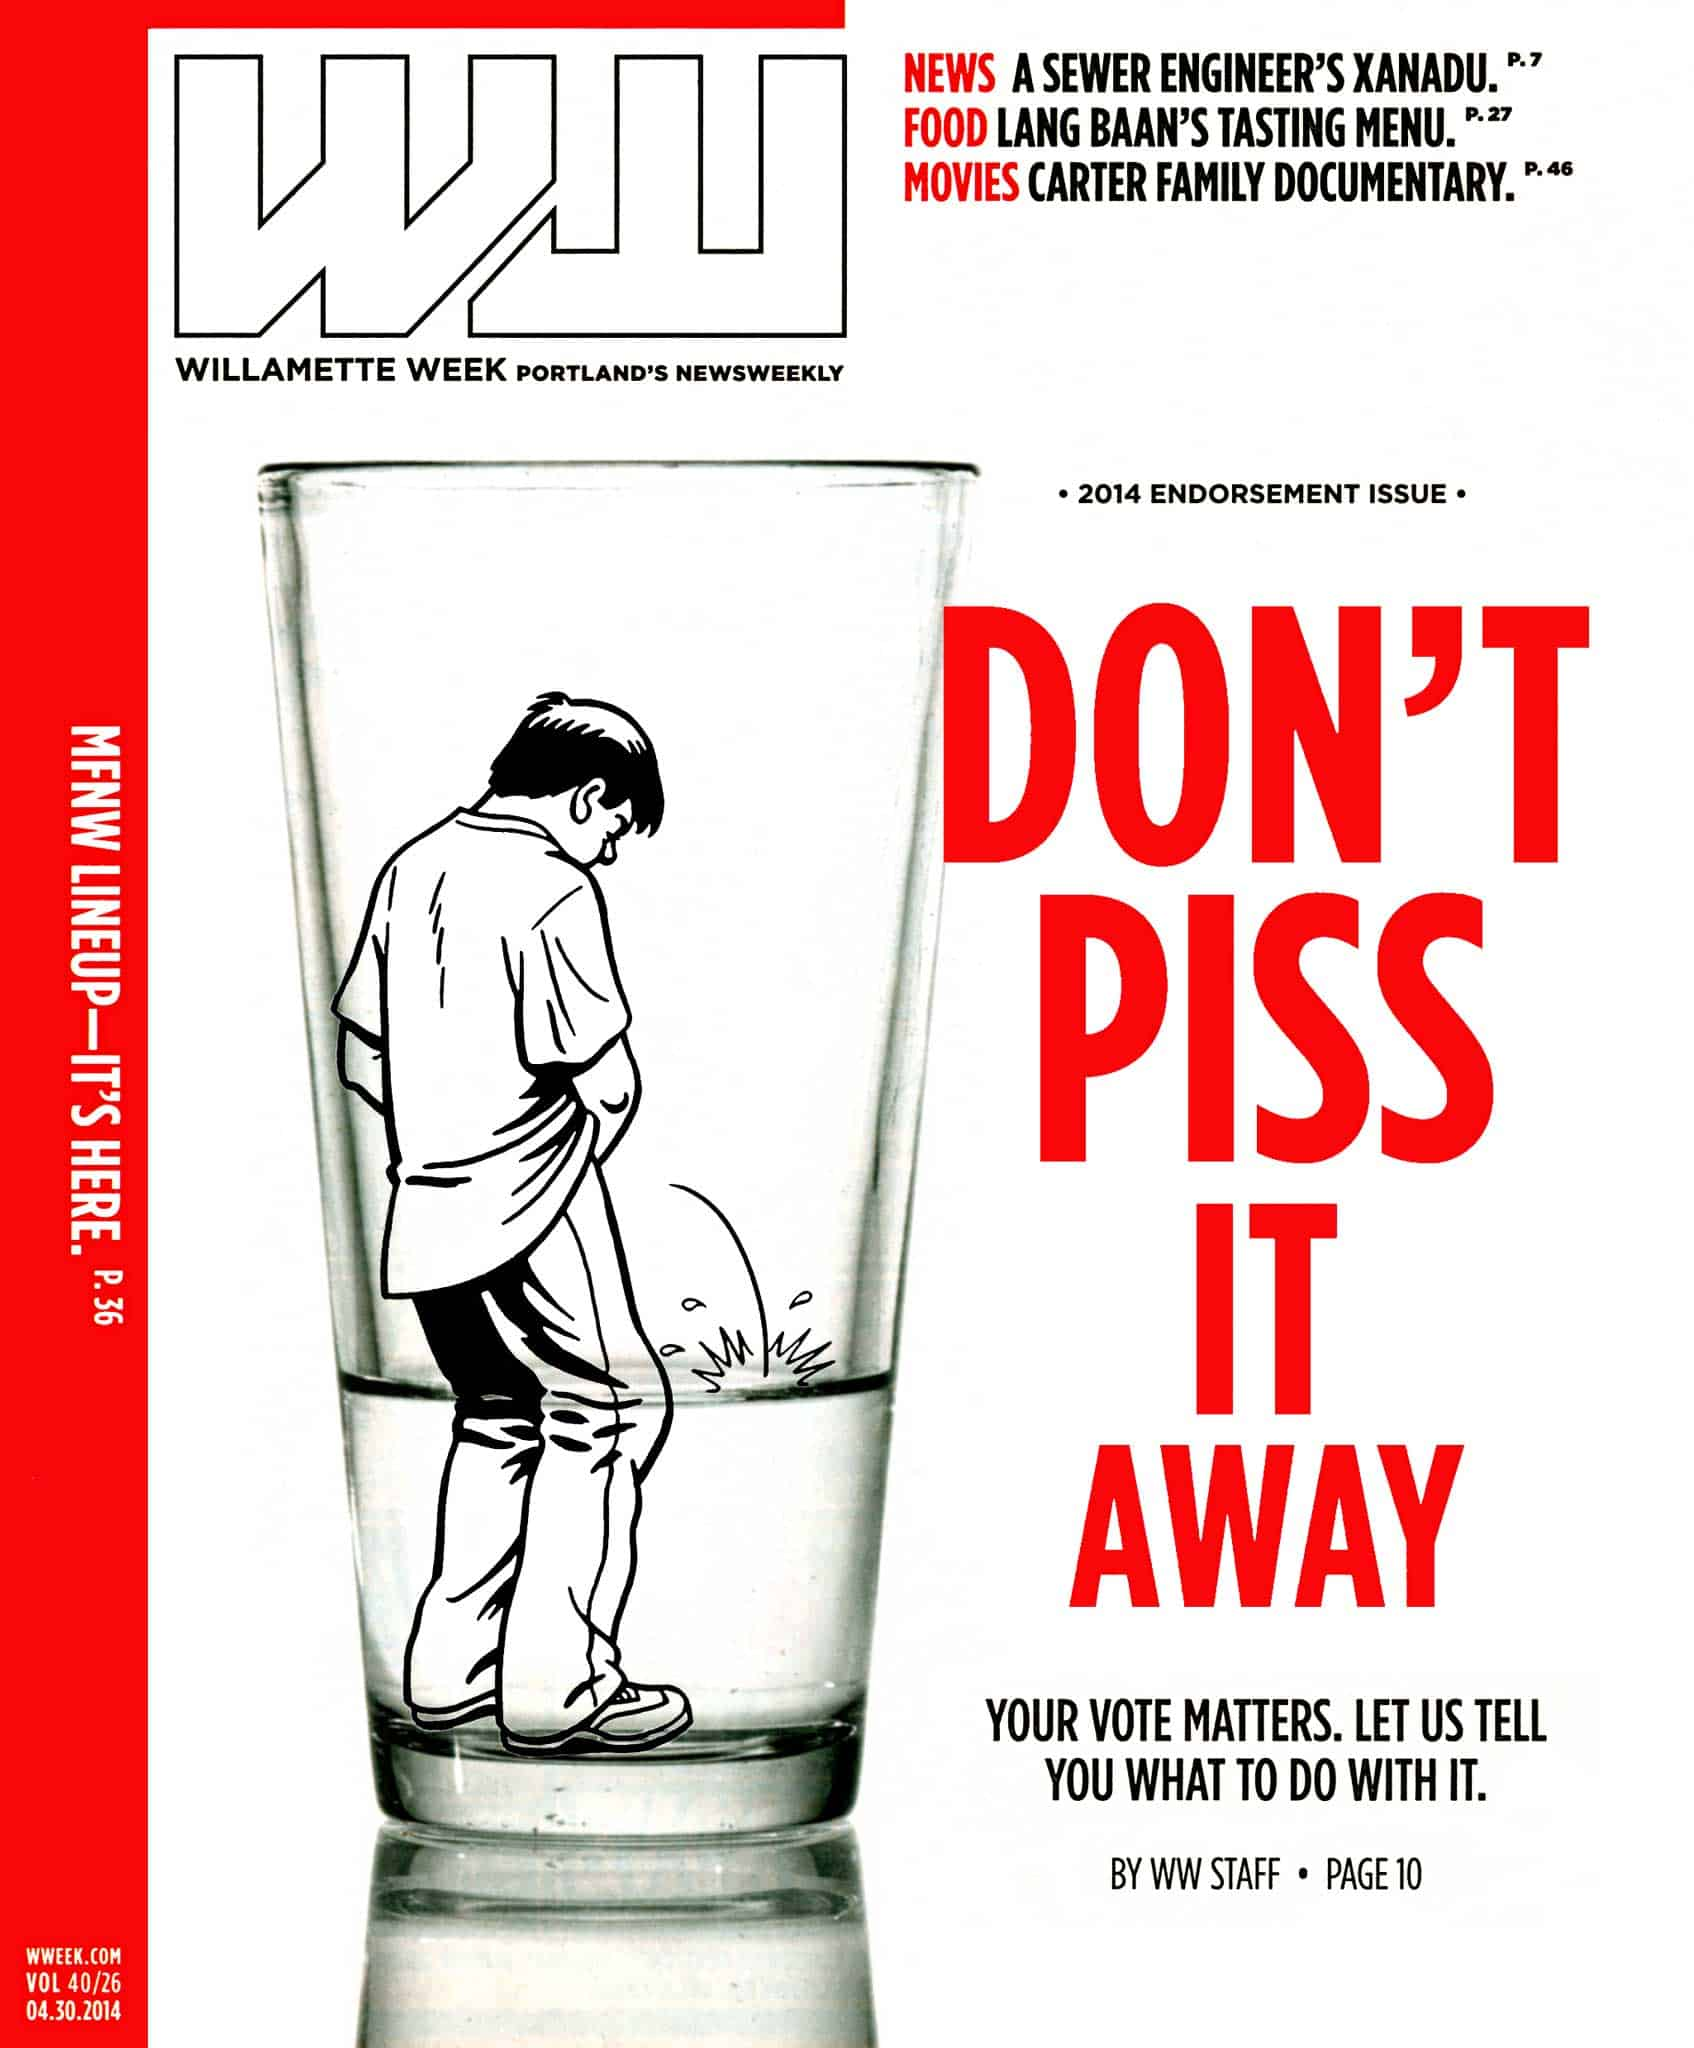 KH3319-boy-pissing-water-glass